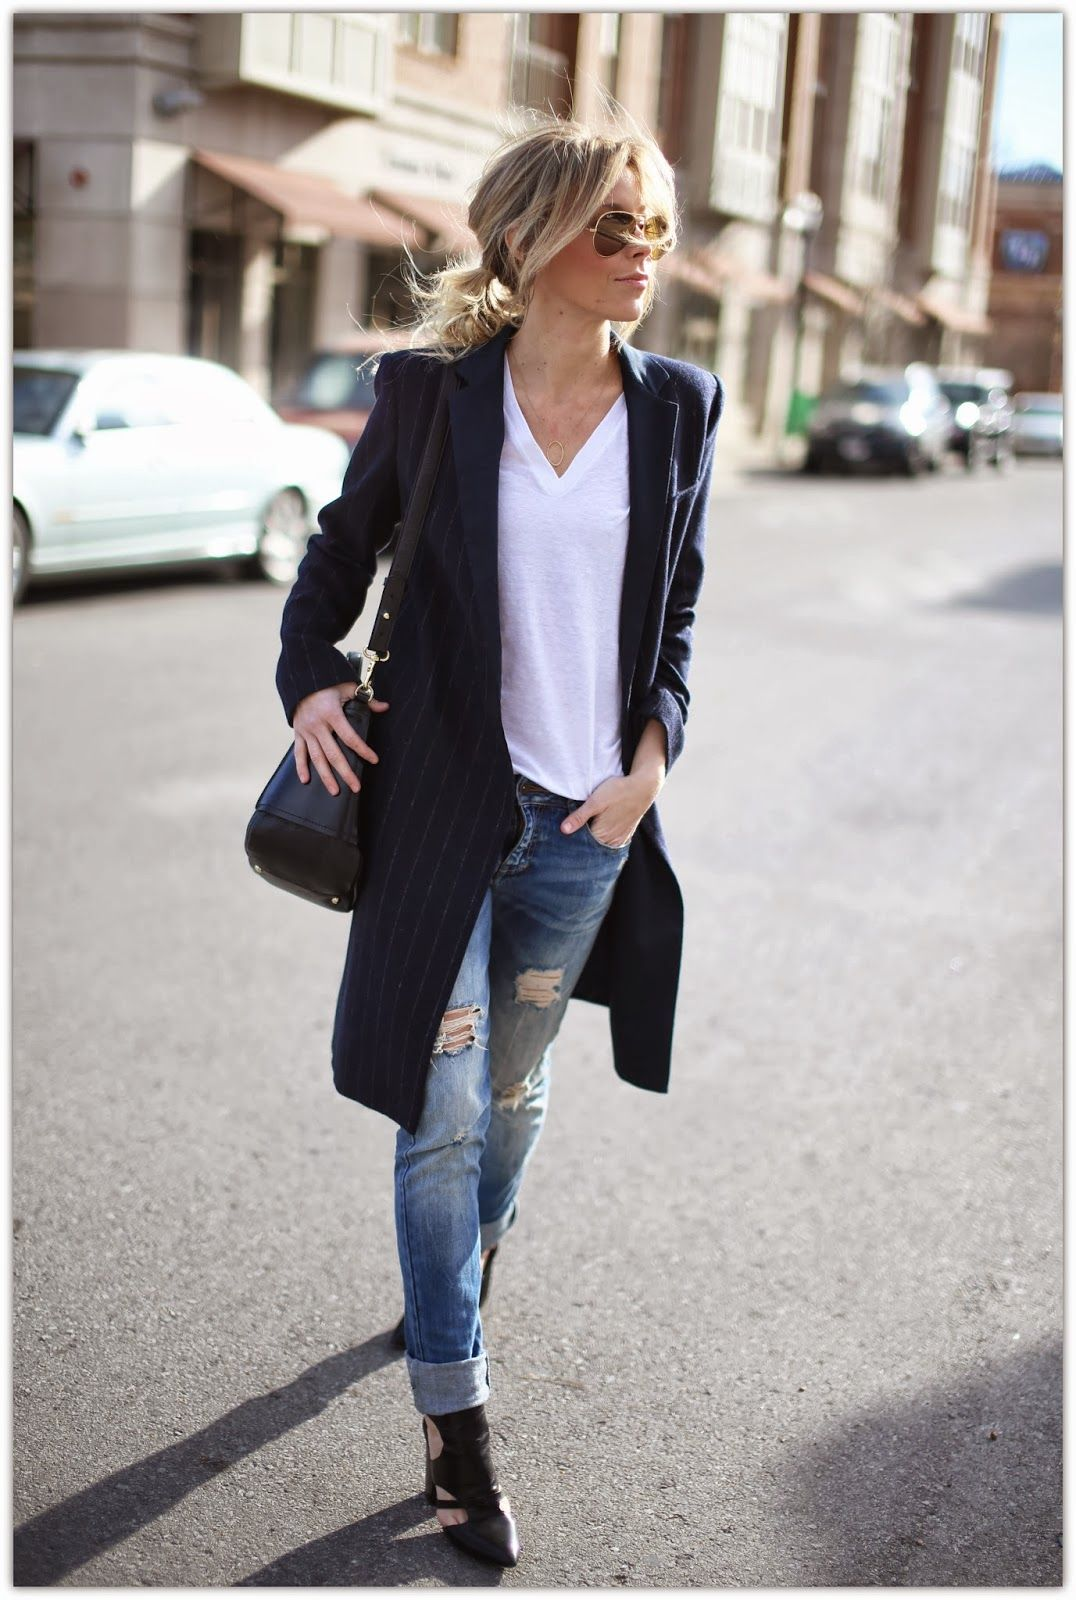 Style Minimal Boyfriend S Jeans Womenswear Denim Outfit Style Fall Coat Darkblue Outfits Fruhling Sommer Stiefeletten Jeans Dunkelblaue Jeans Y S